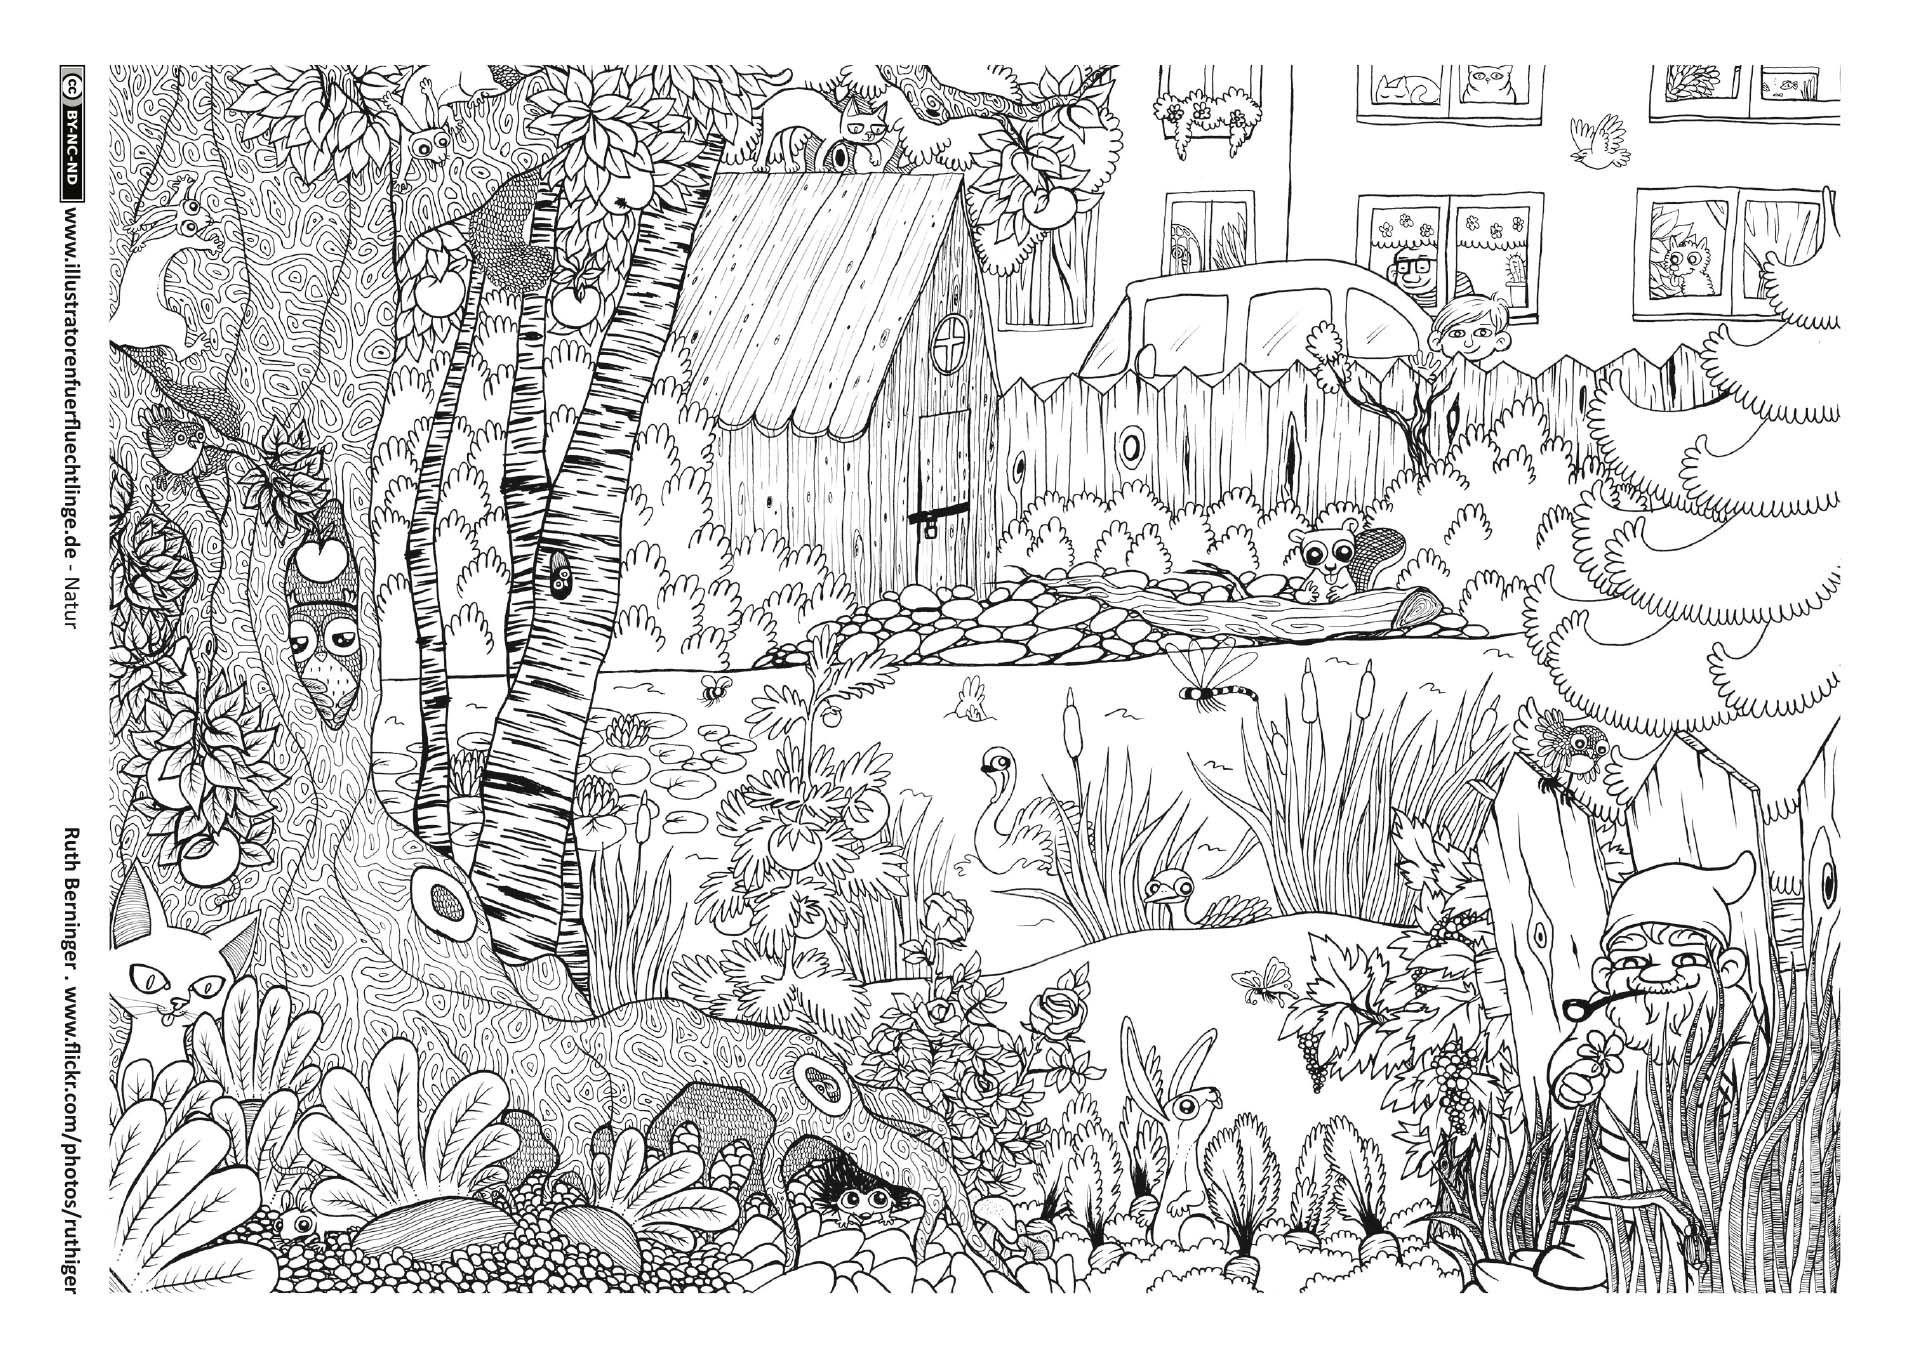 Ausmalbilder Malen Nach Zahlen Neu Garten Tiere Wimmelbild … Dot to Dots Pinterest Einzigartig Fotografieren